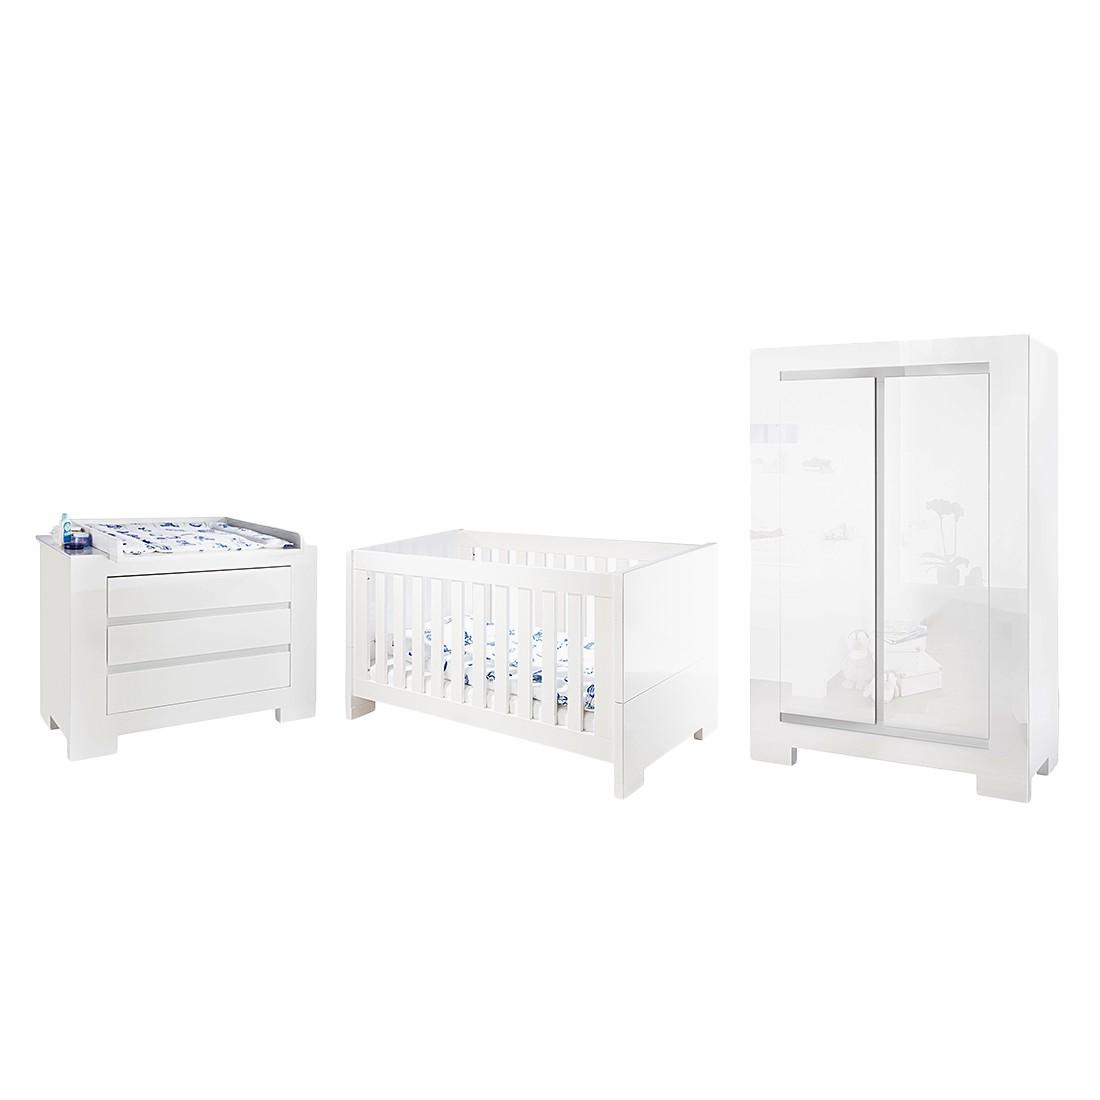 Chambre de bébé Sky Kids - Vernis blanc, Pinolino